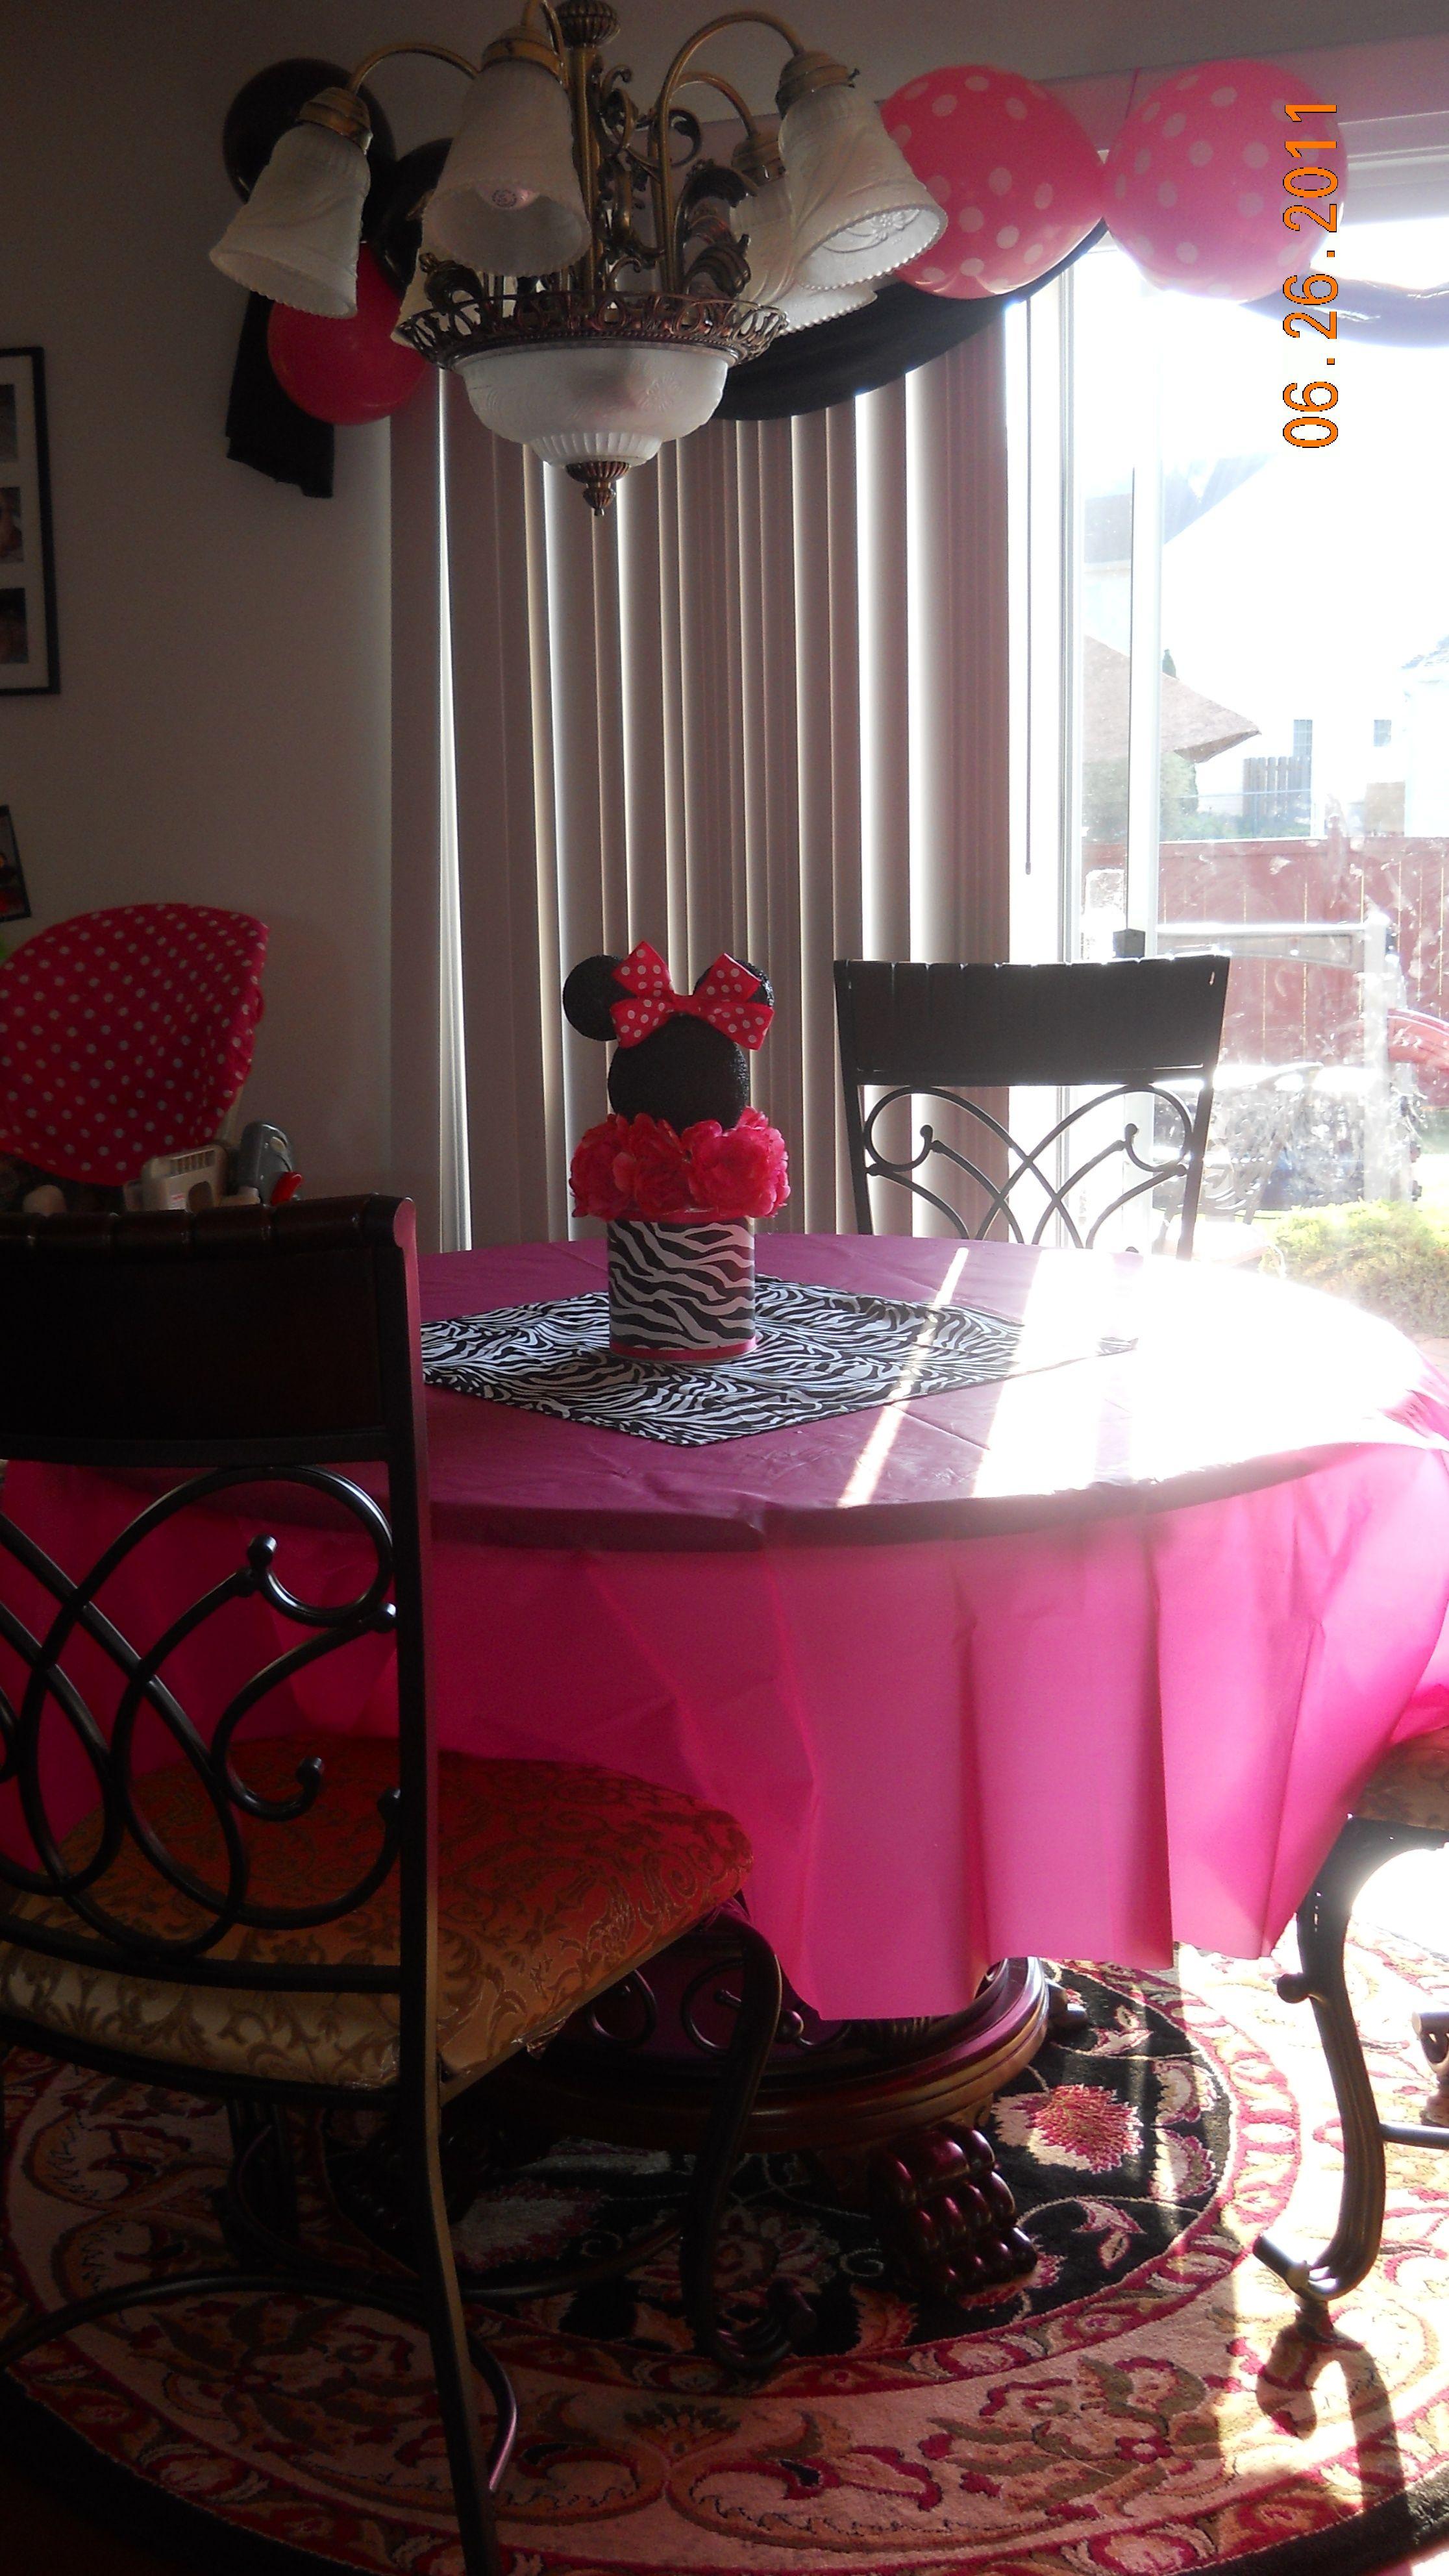 I Bought The Black And Pink Polka Dot Balloons At Hobby Lobby And